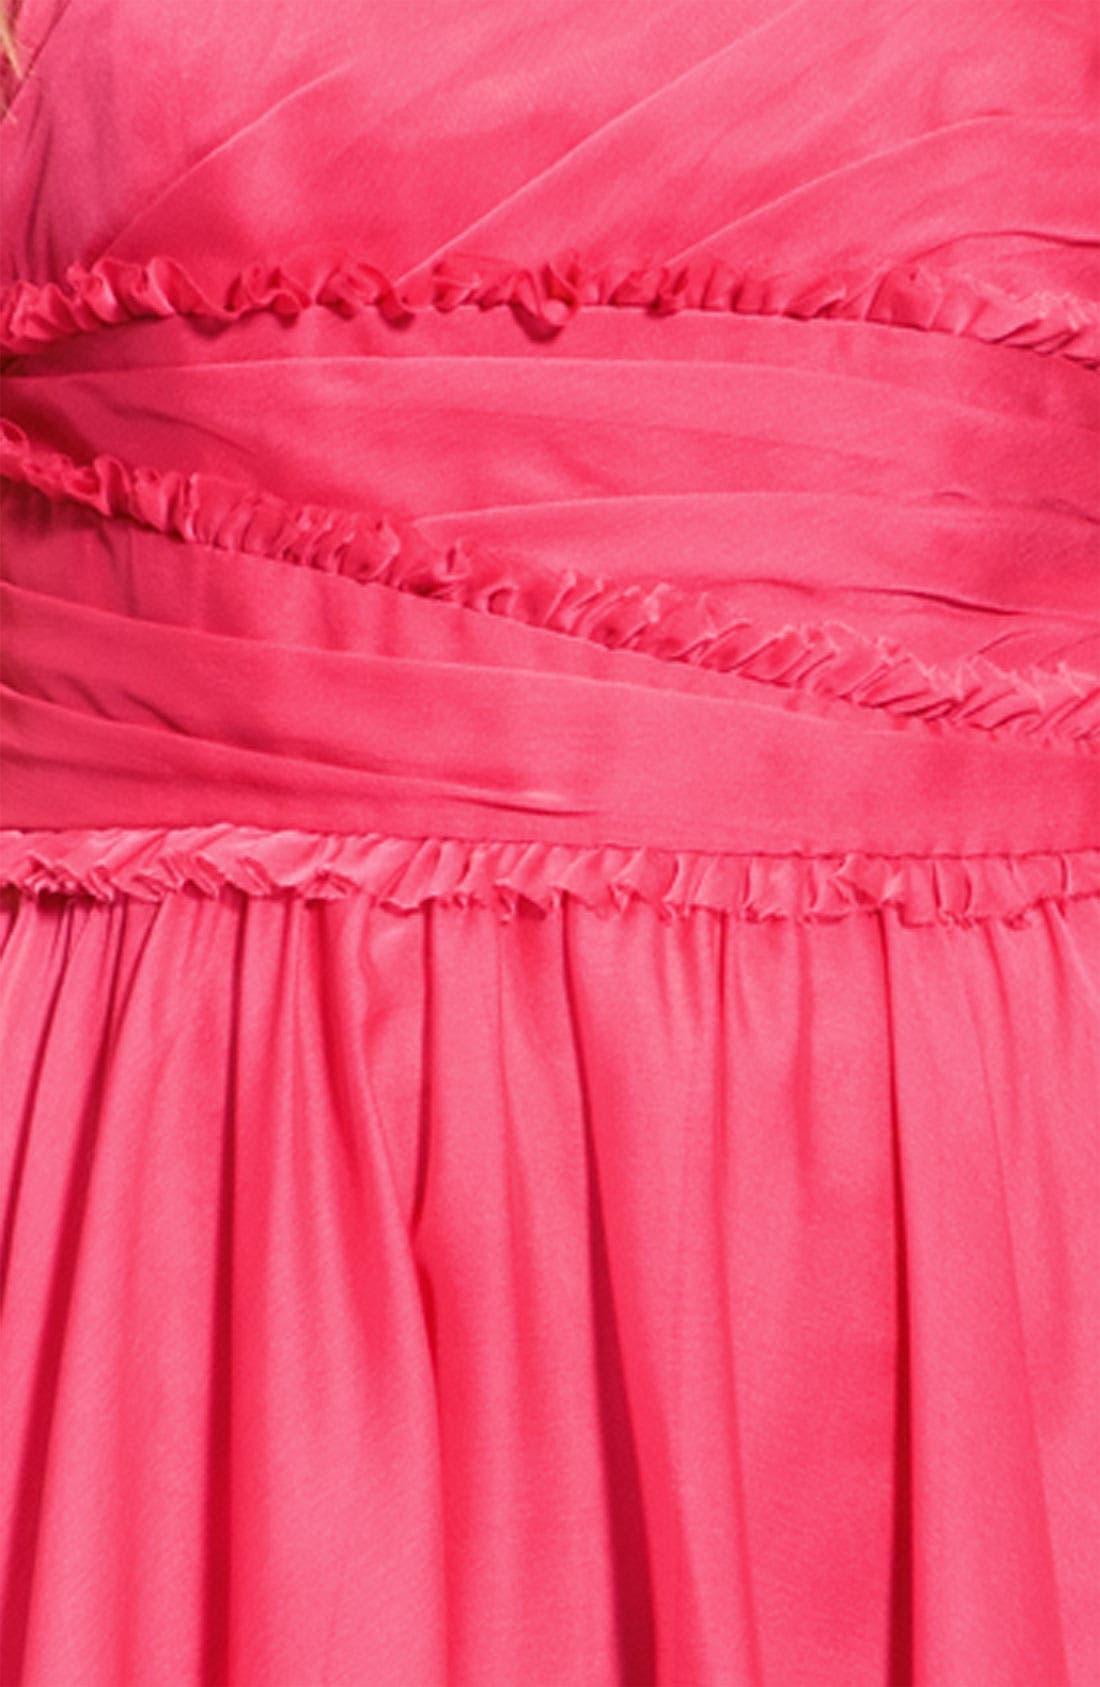 Alternate Image 4  - ML Monique Lhuillier Bridesmaids Ruffle Chiffon Dress (Nordstrom Exclusive)